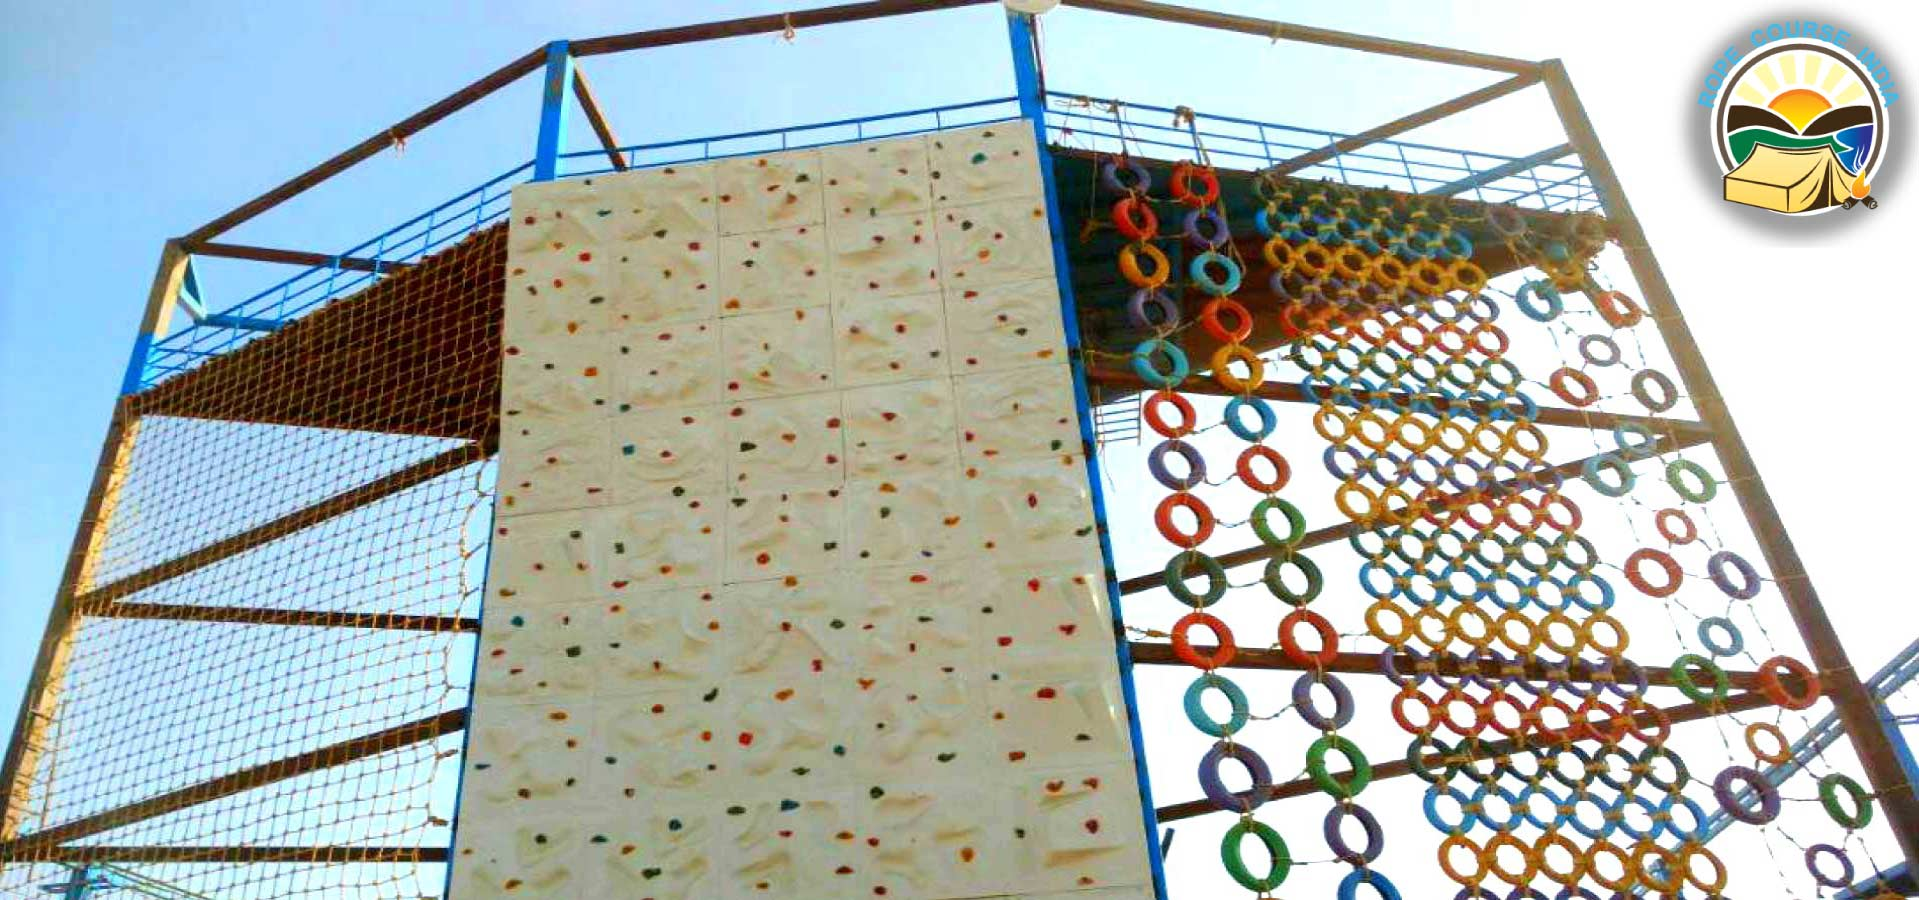 Rock climbing wall setup cost in india | rock climbing ...